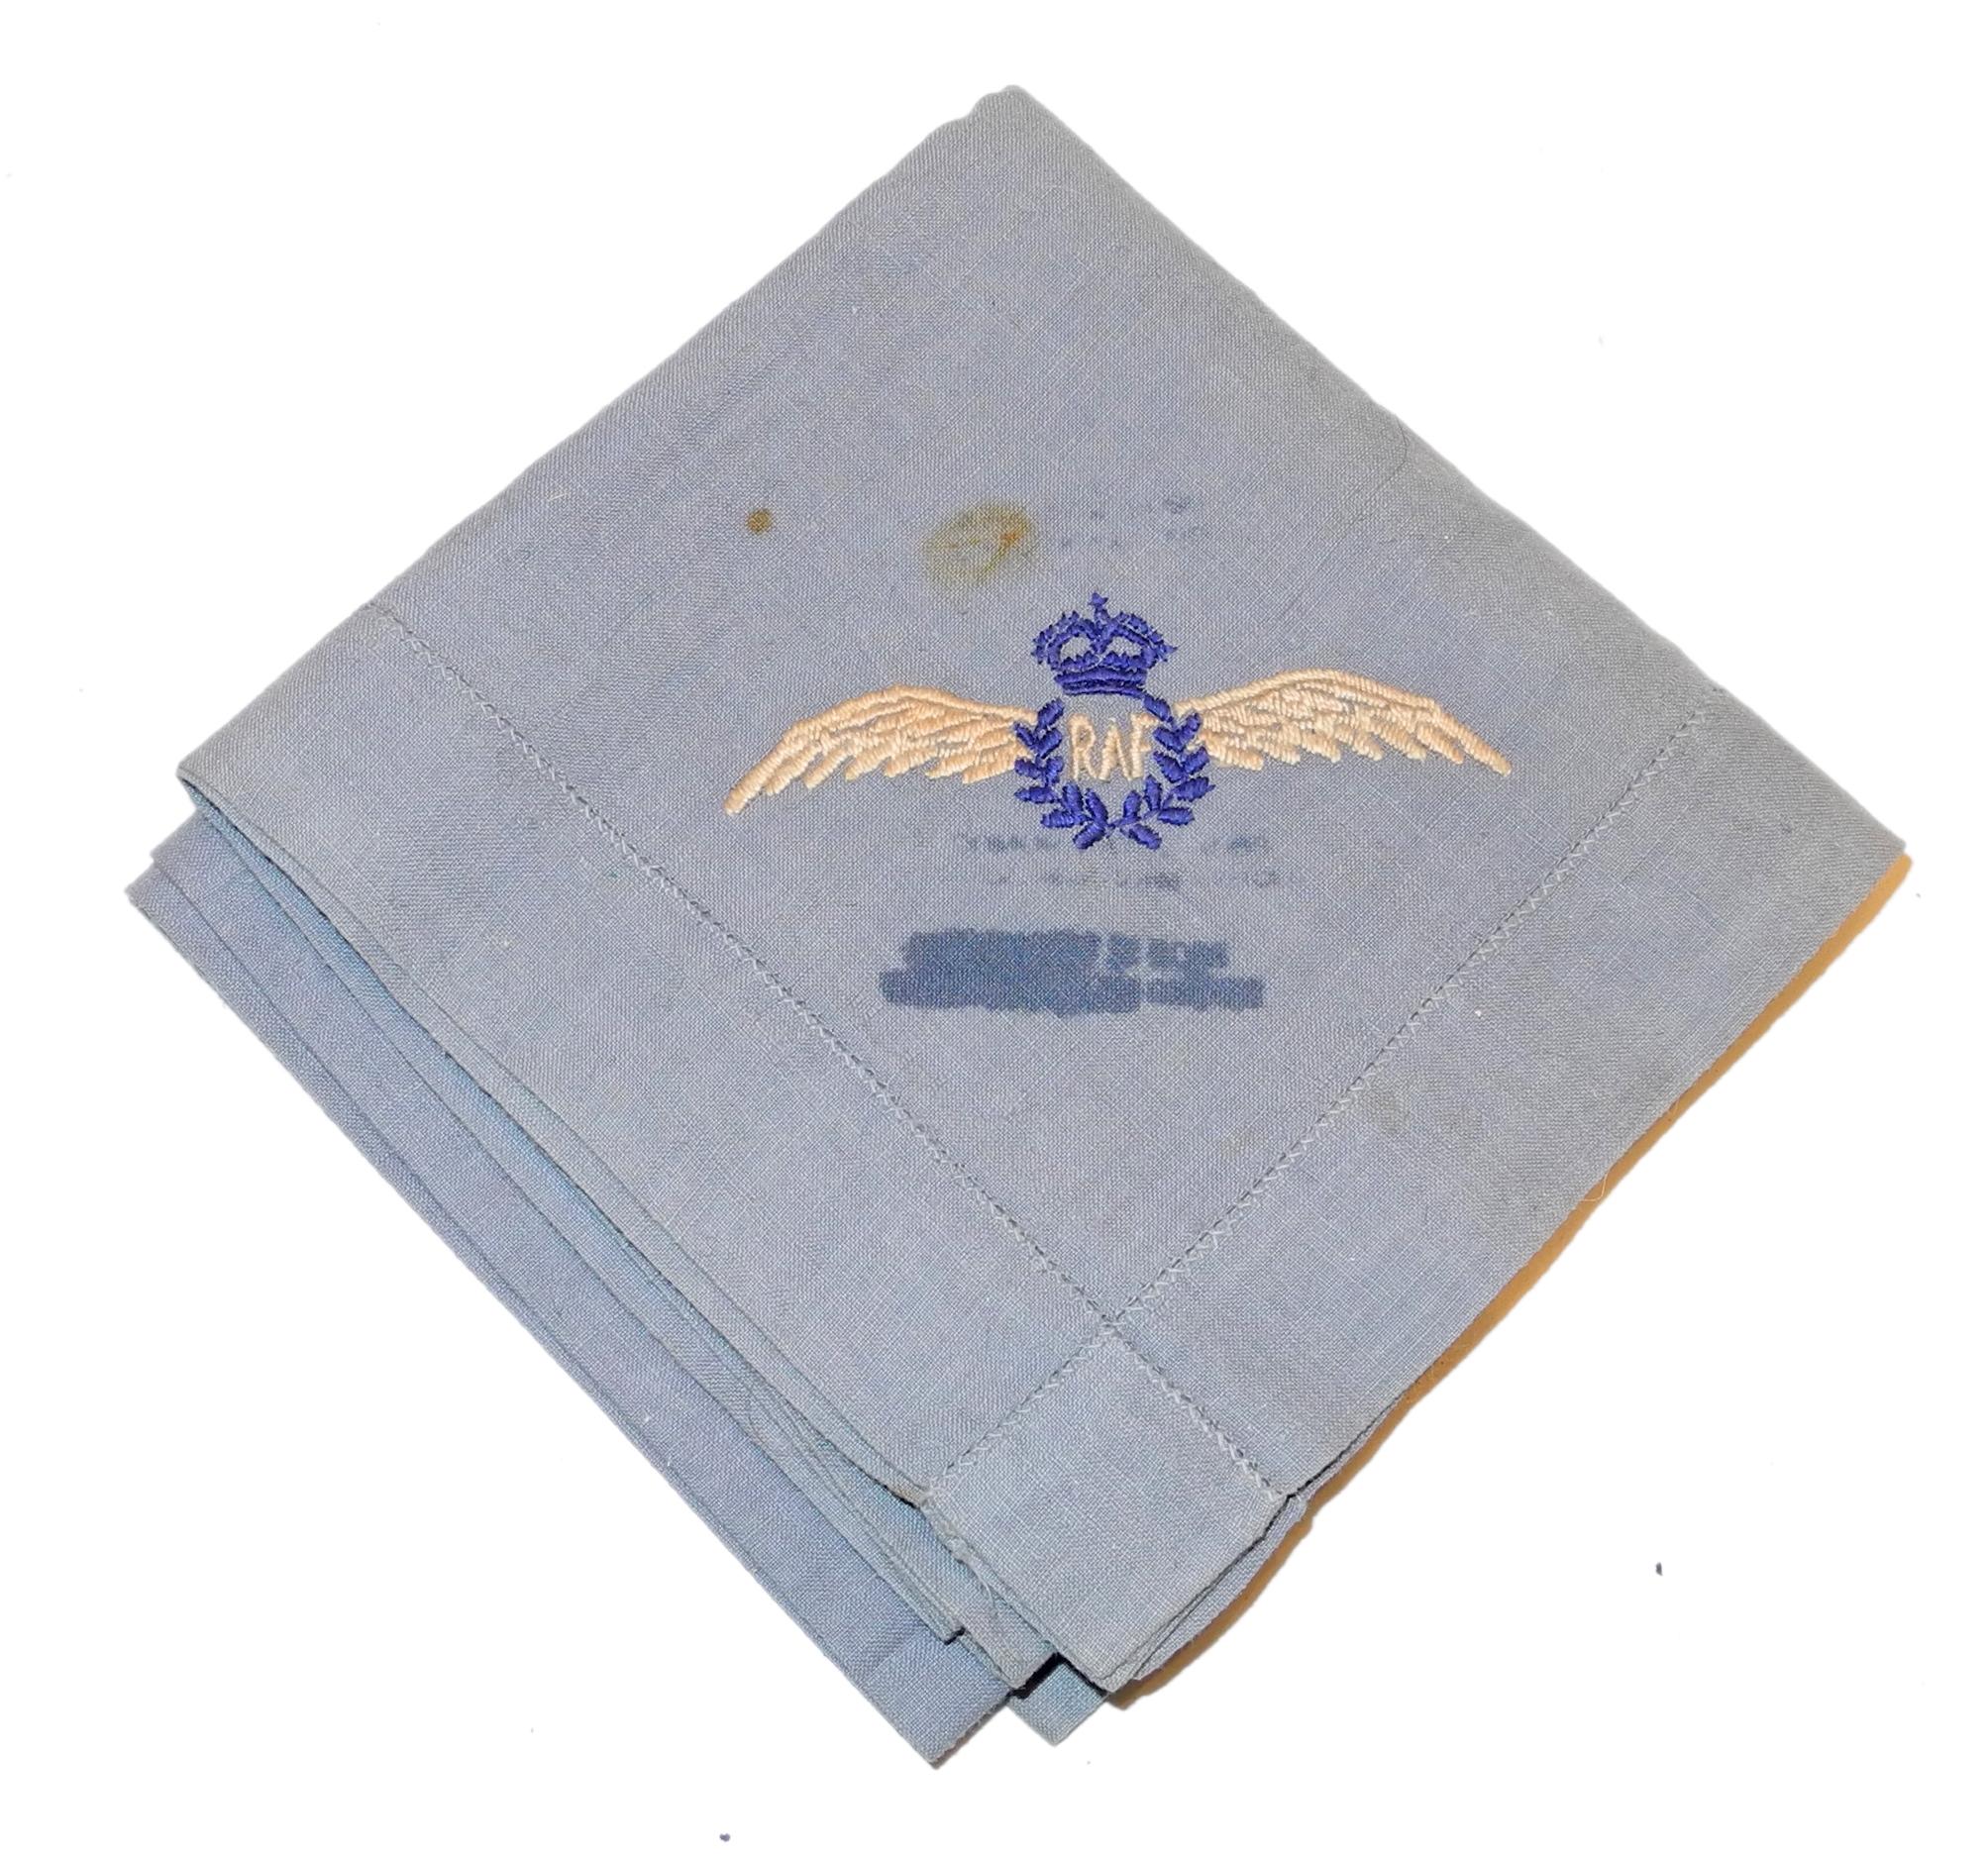 RAF pilot's handkerchief